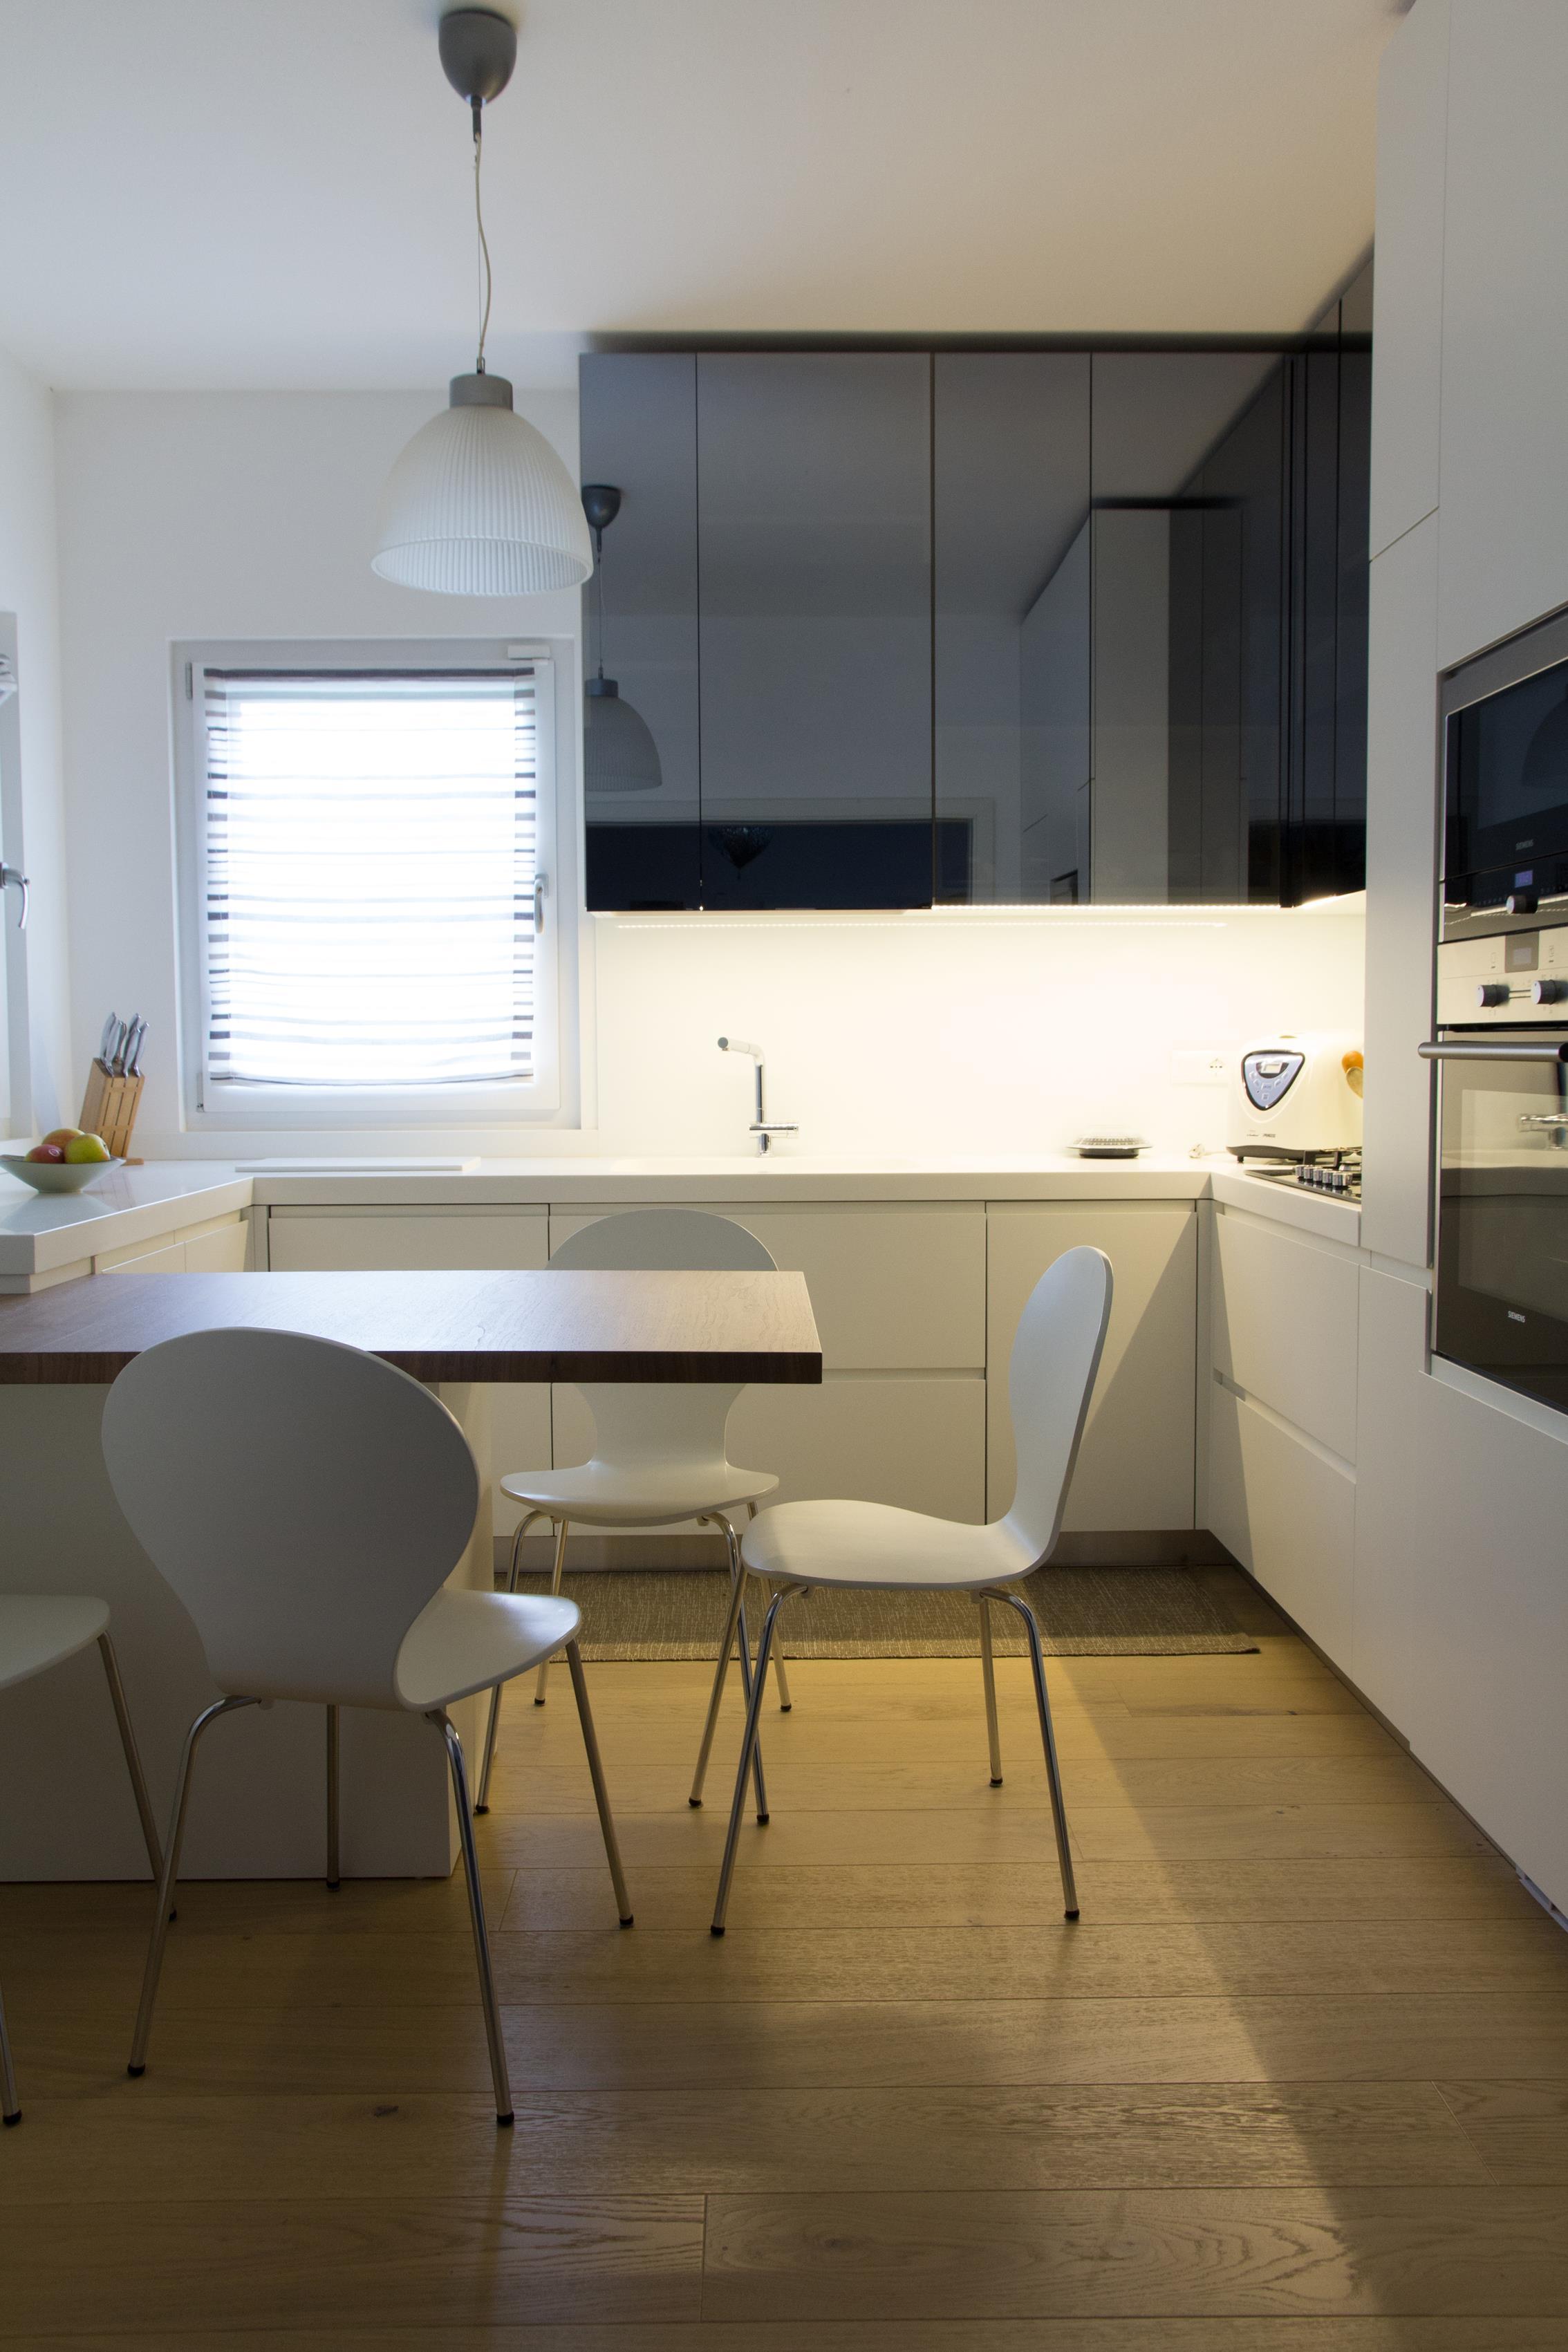 Cucine In Corian. Good Rastelli Cucine Is An Kitchen Company ...